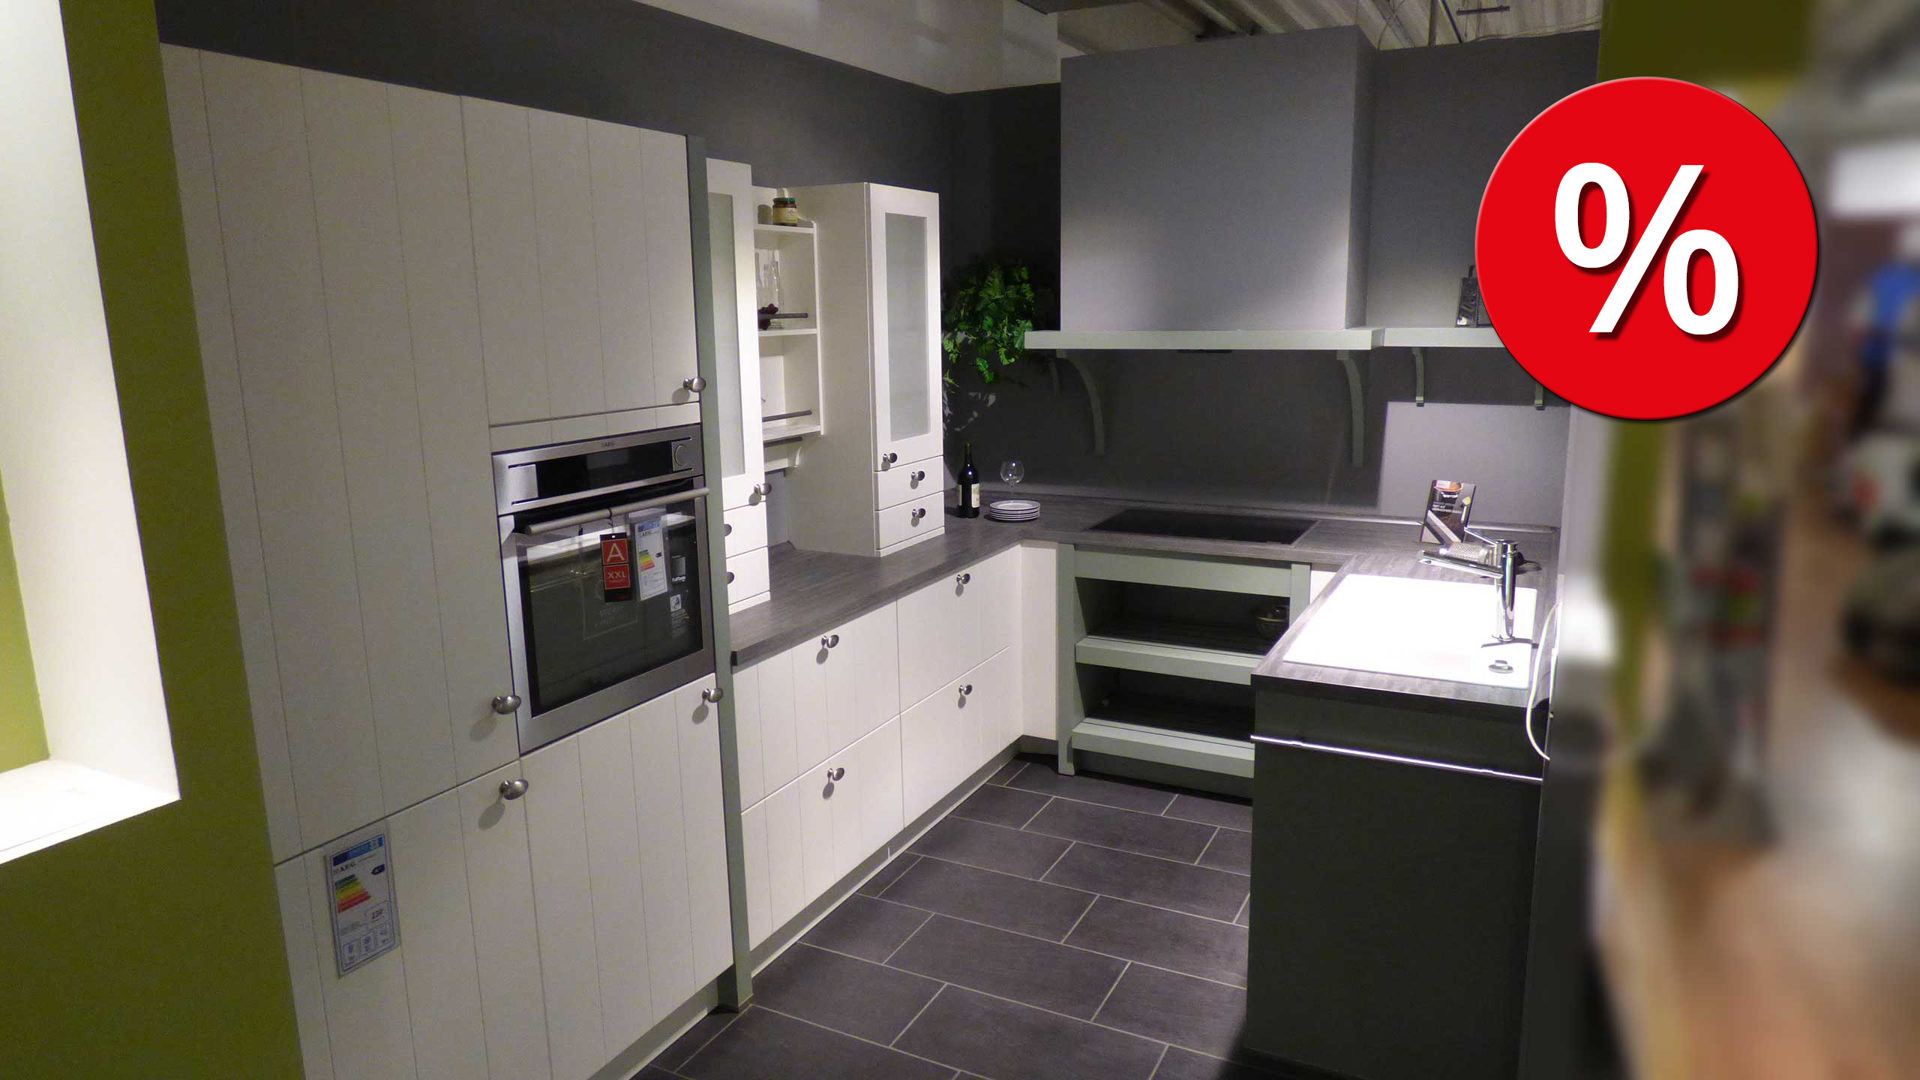 Stark reduzierte Schüller Küche, Einbauküche DOMUS inkl. AEG E-Geräte, Lack  weiss Seidenglanz 103, Arbeitsplatte Tonschiefer